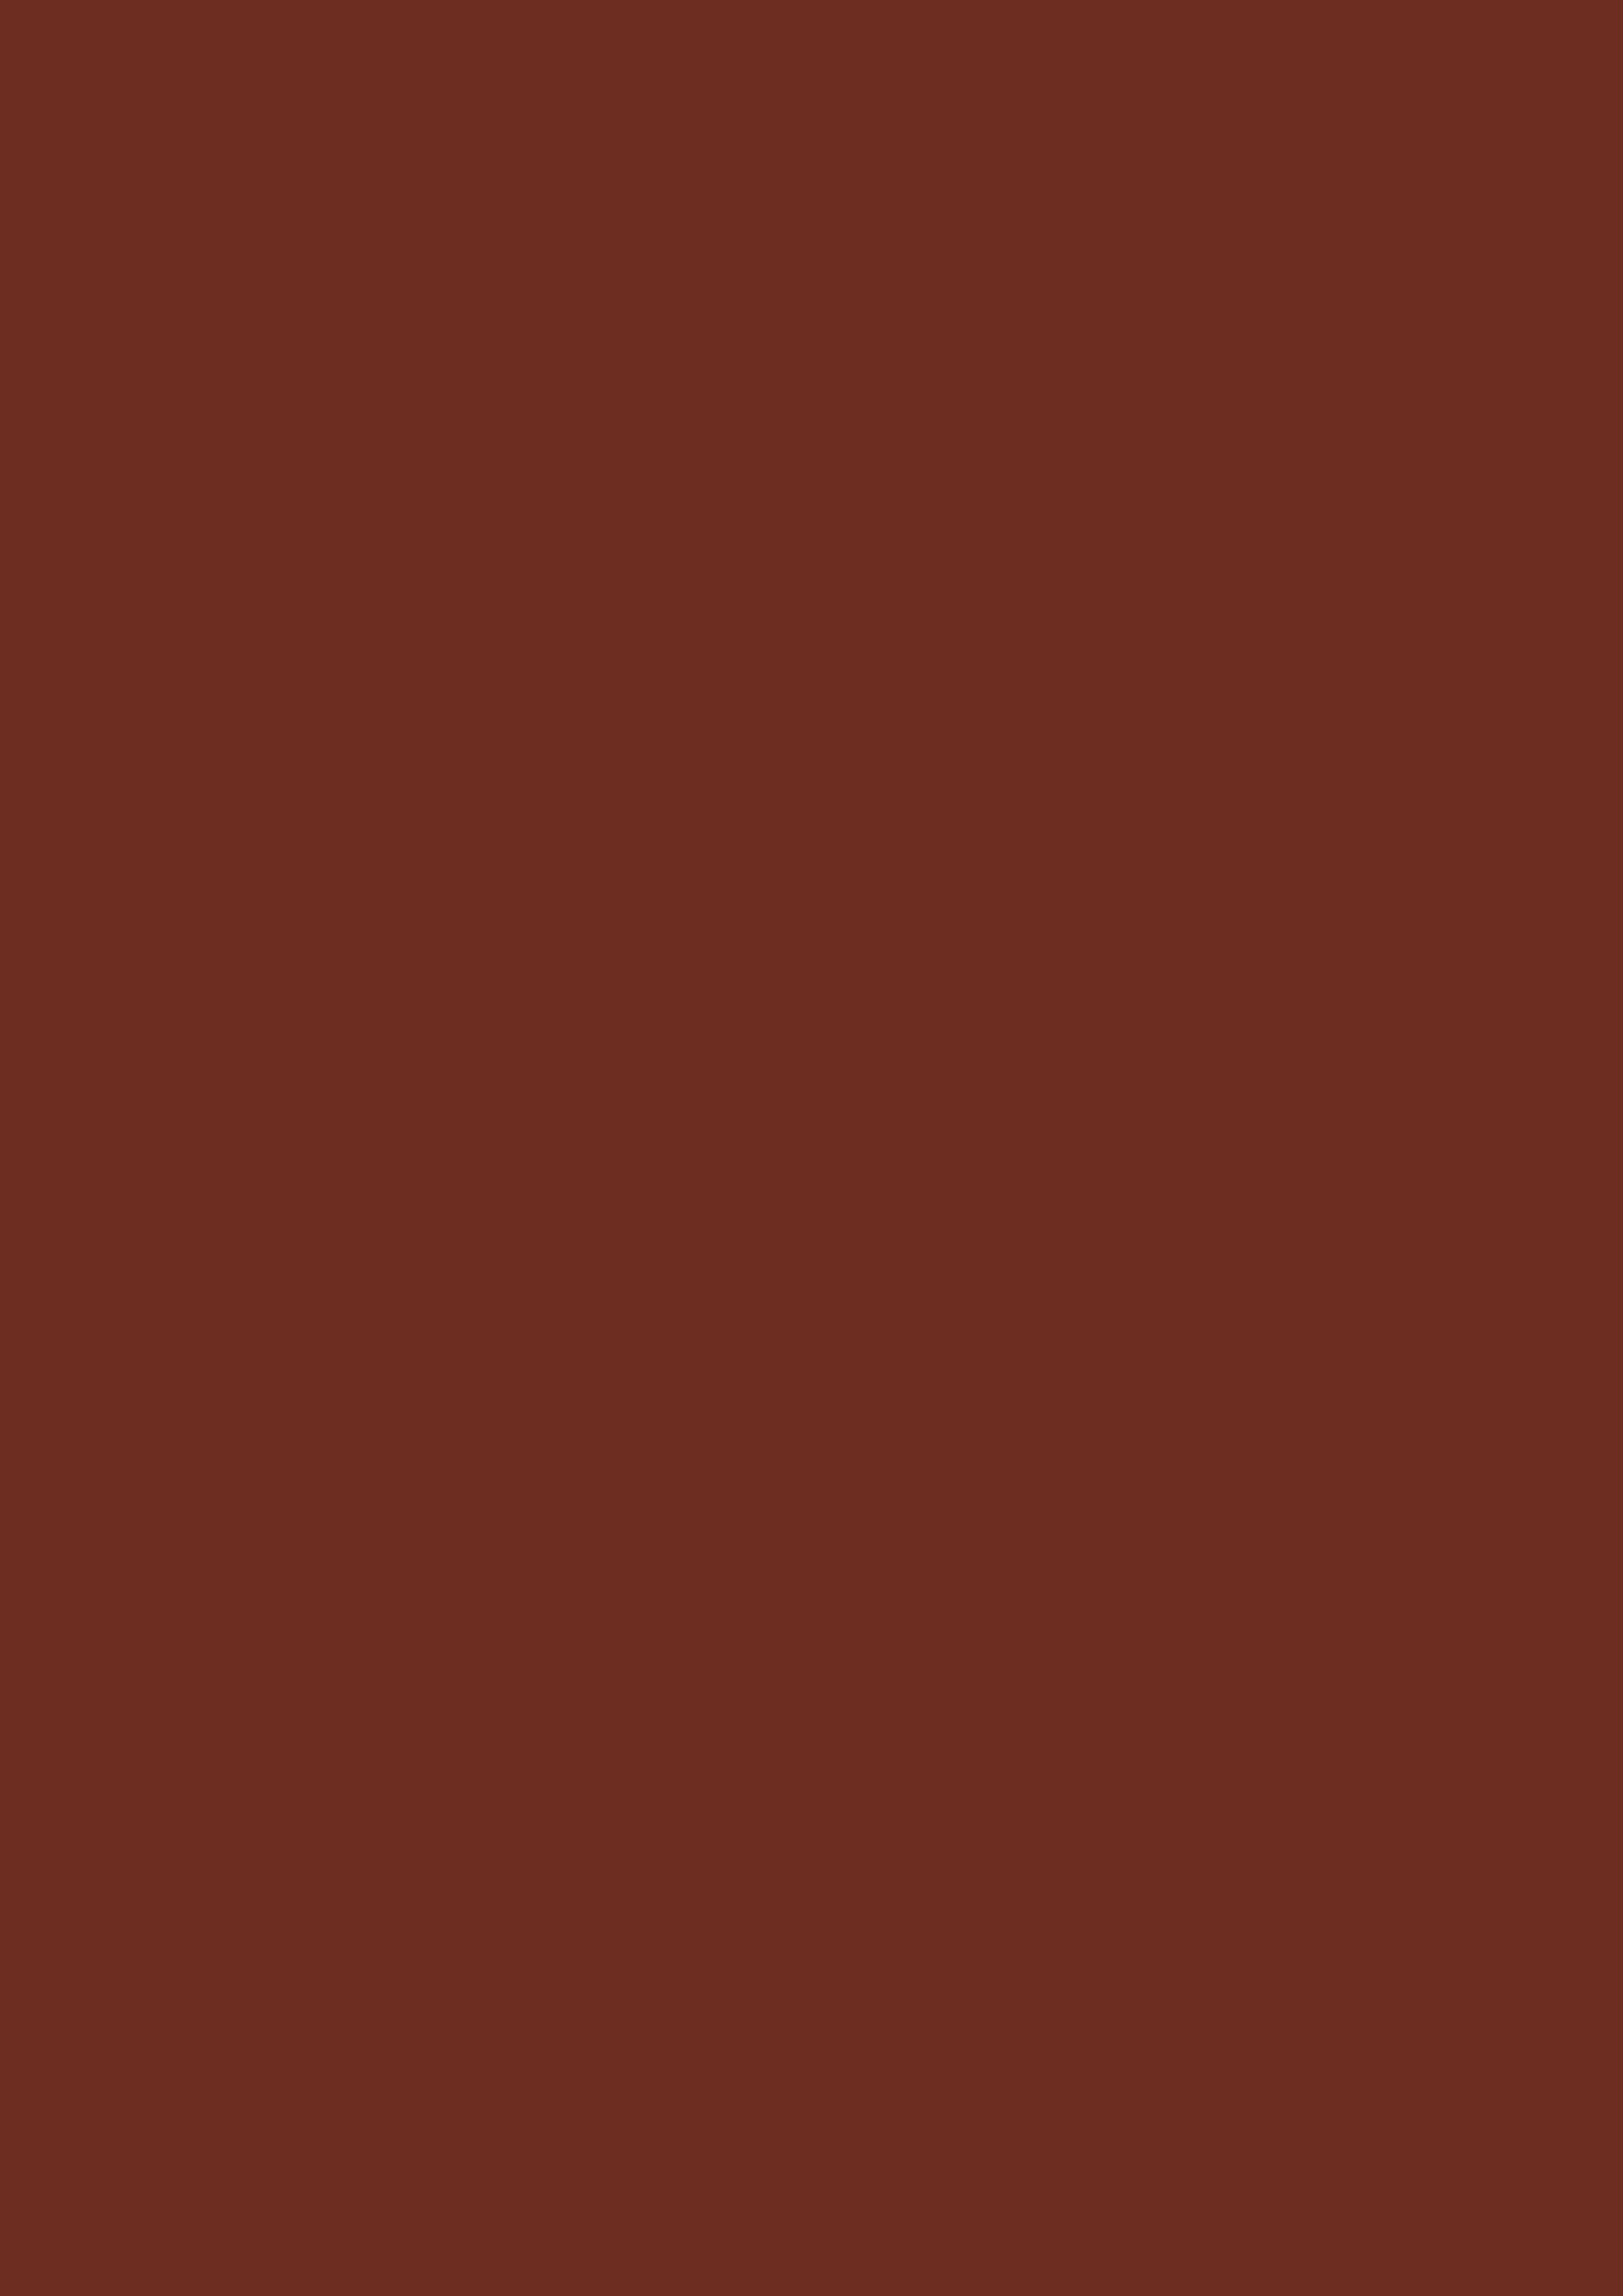 2480x3508 Liver Organ Solid Color Background